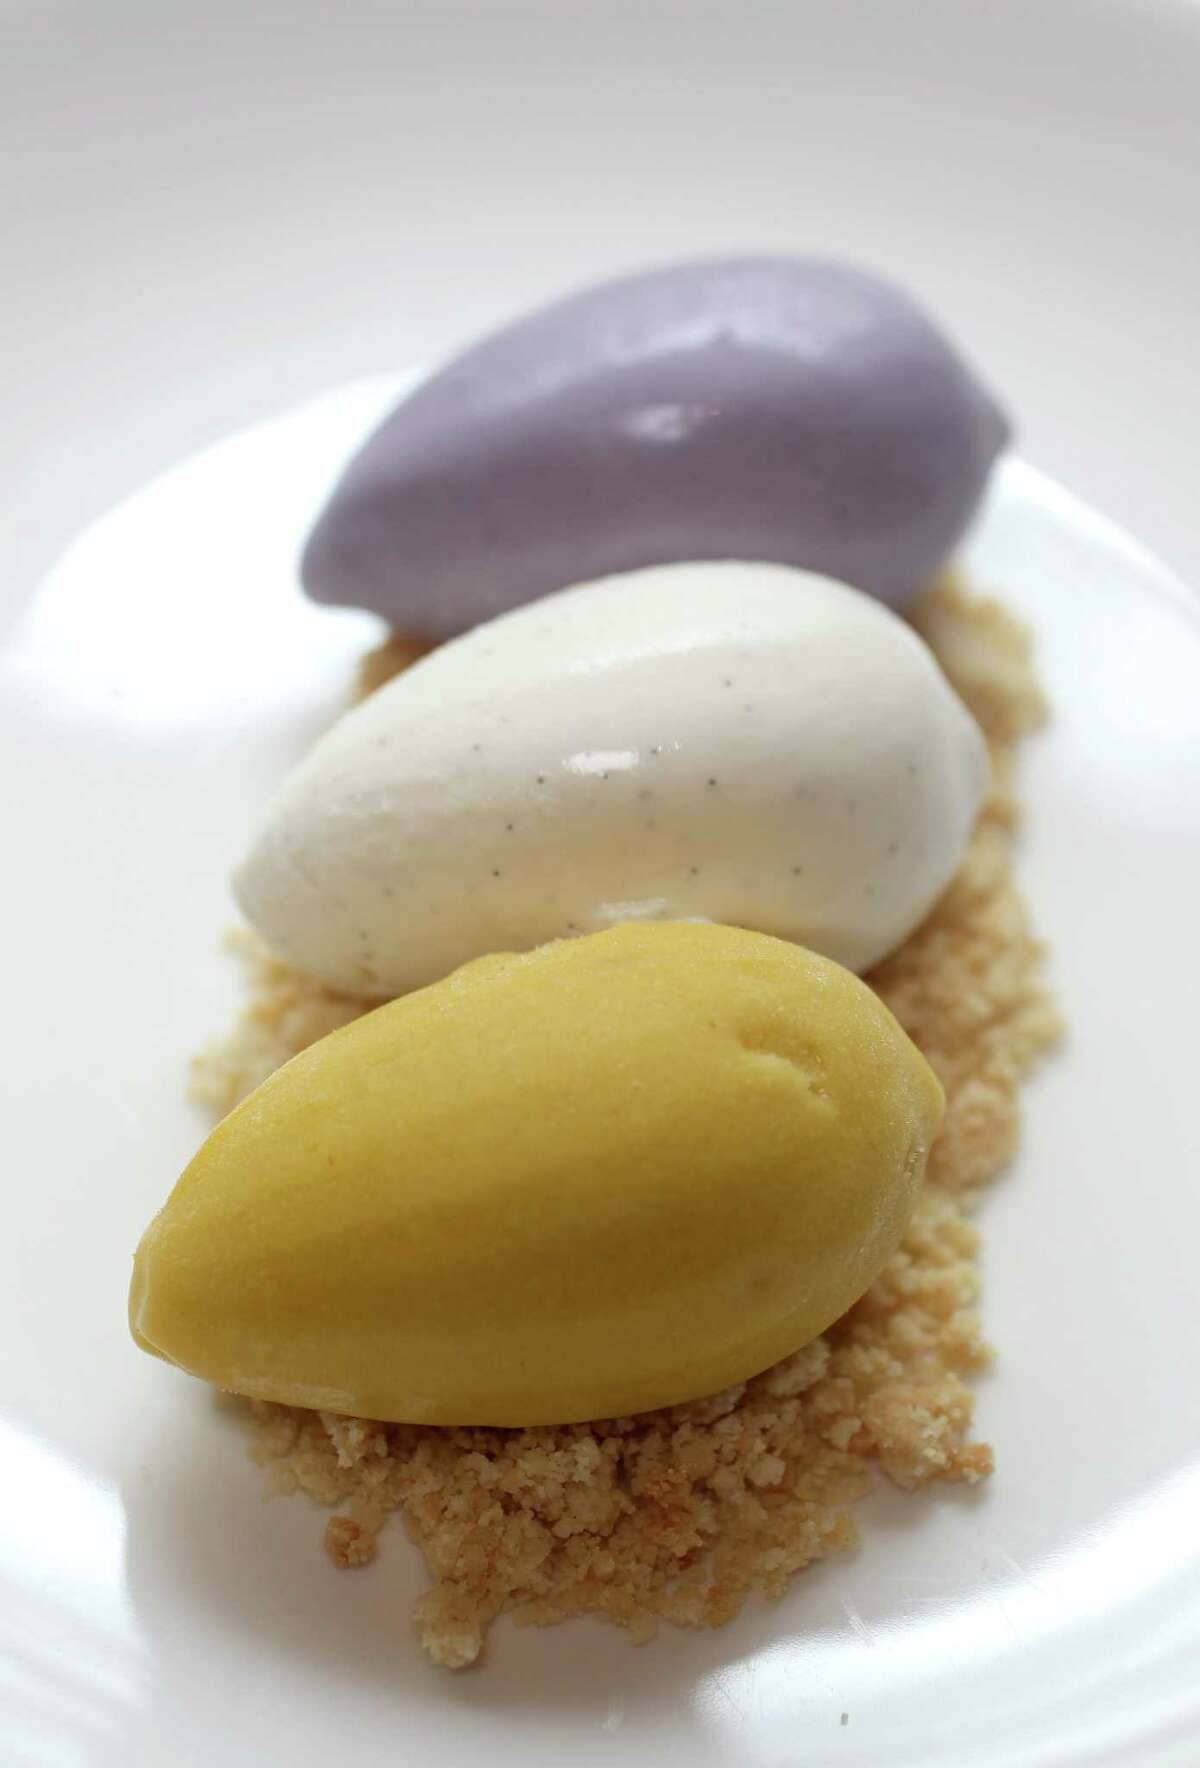 Cloud 10 Creamery's Chris Leung created ice cream flavors (forground to background) Mango/cilantro; vanilla bean; and